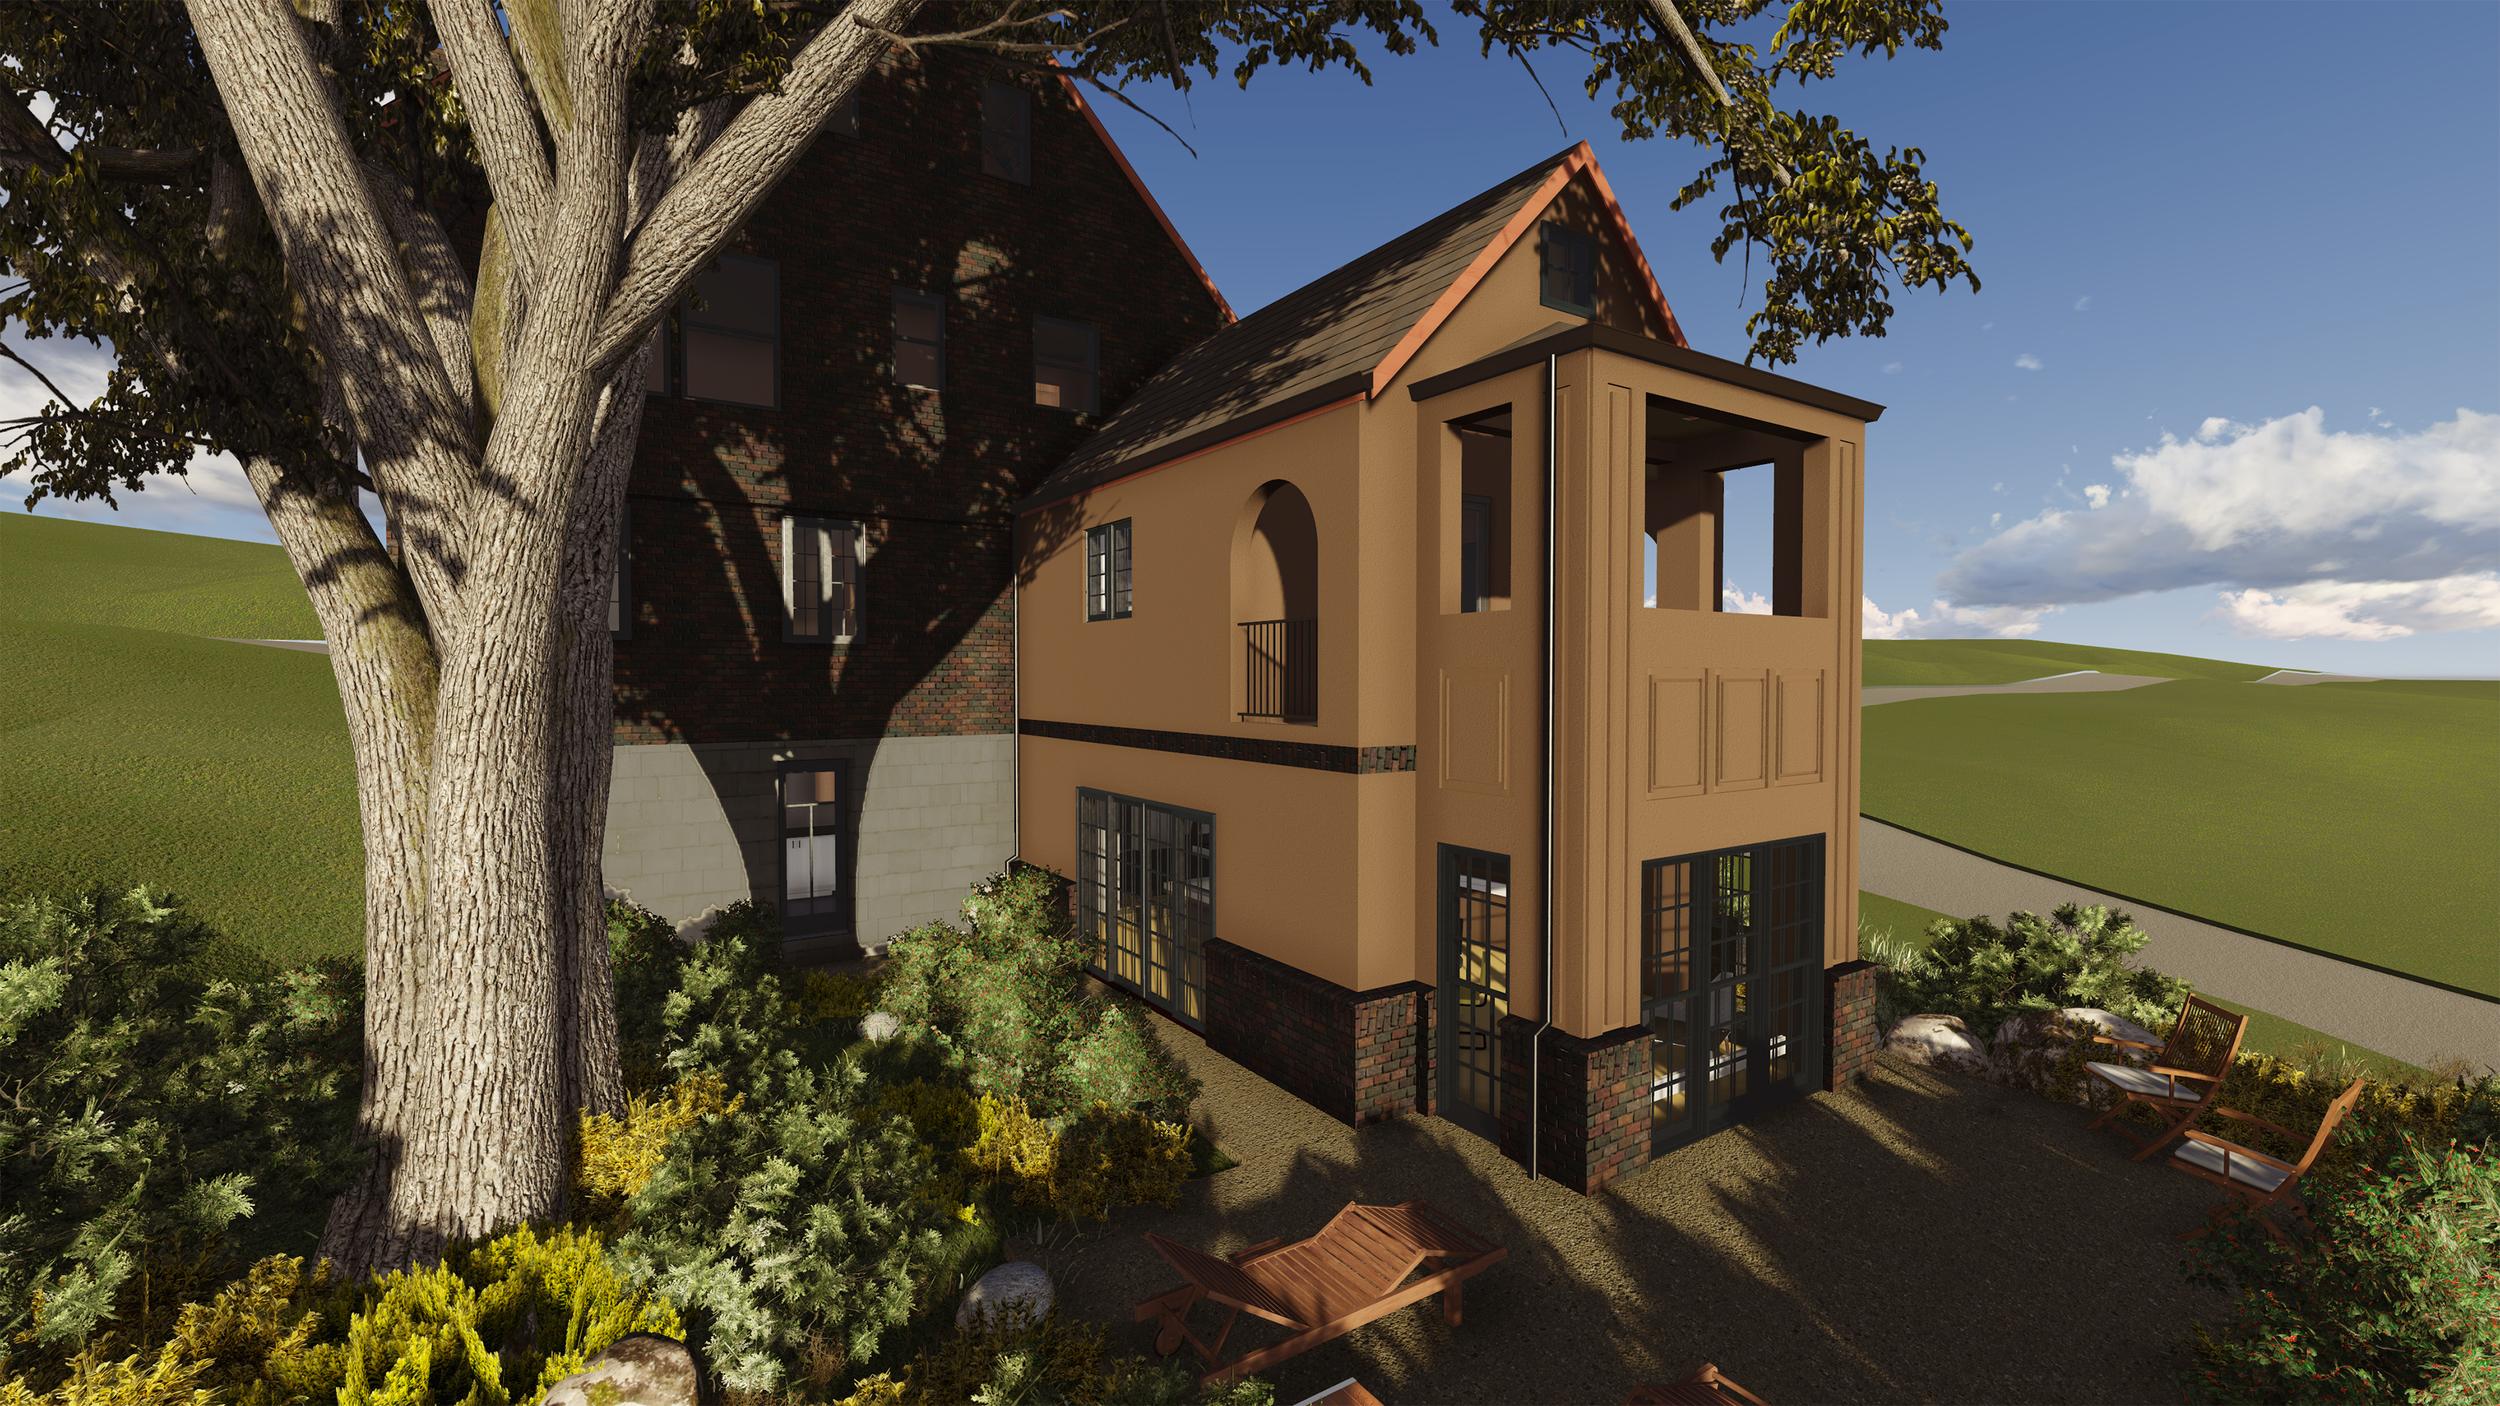 PROCESS: Exterior Finish Design Option 2